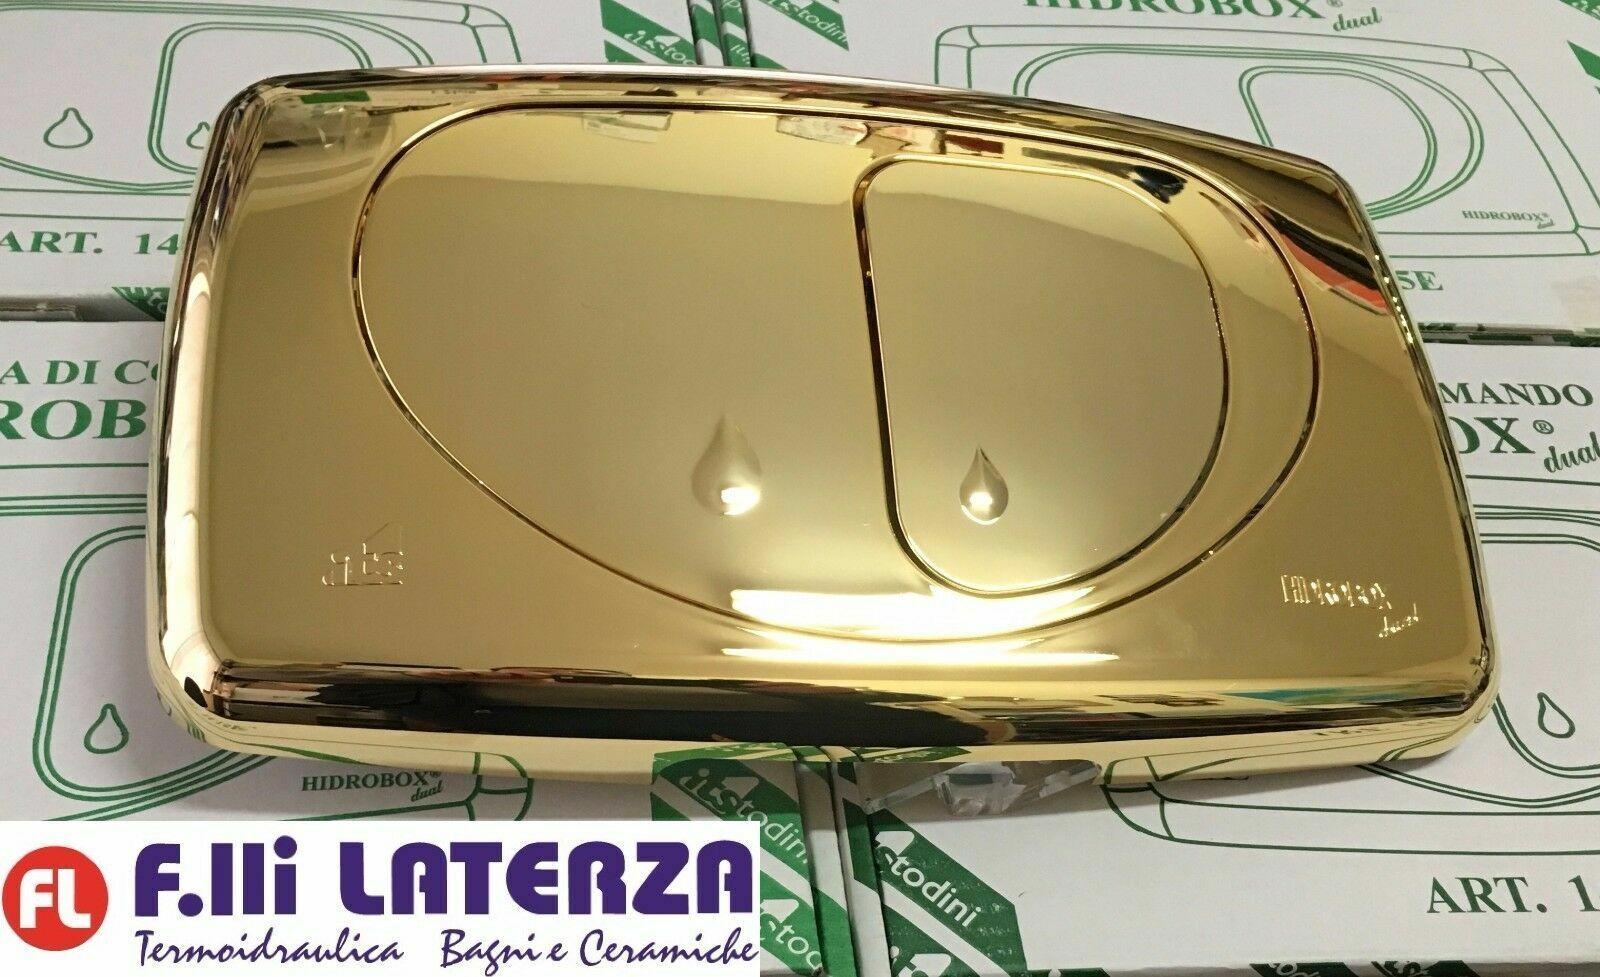 KIT PLATE CONTROL DUAL EVOLUTION BRIGHT oro BOX BUILT HIDROBOX TODINI